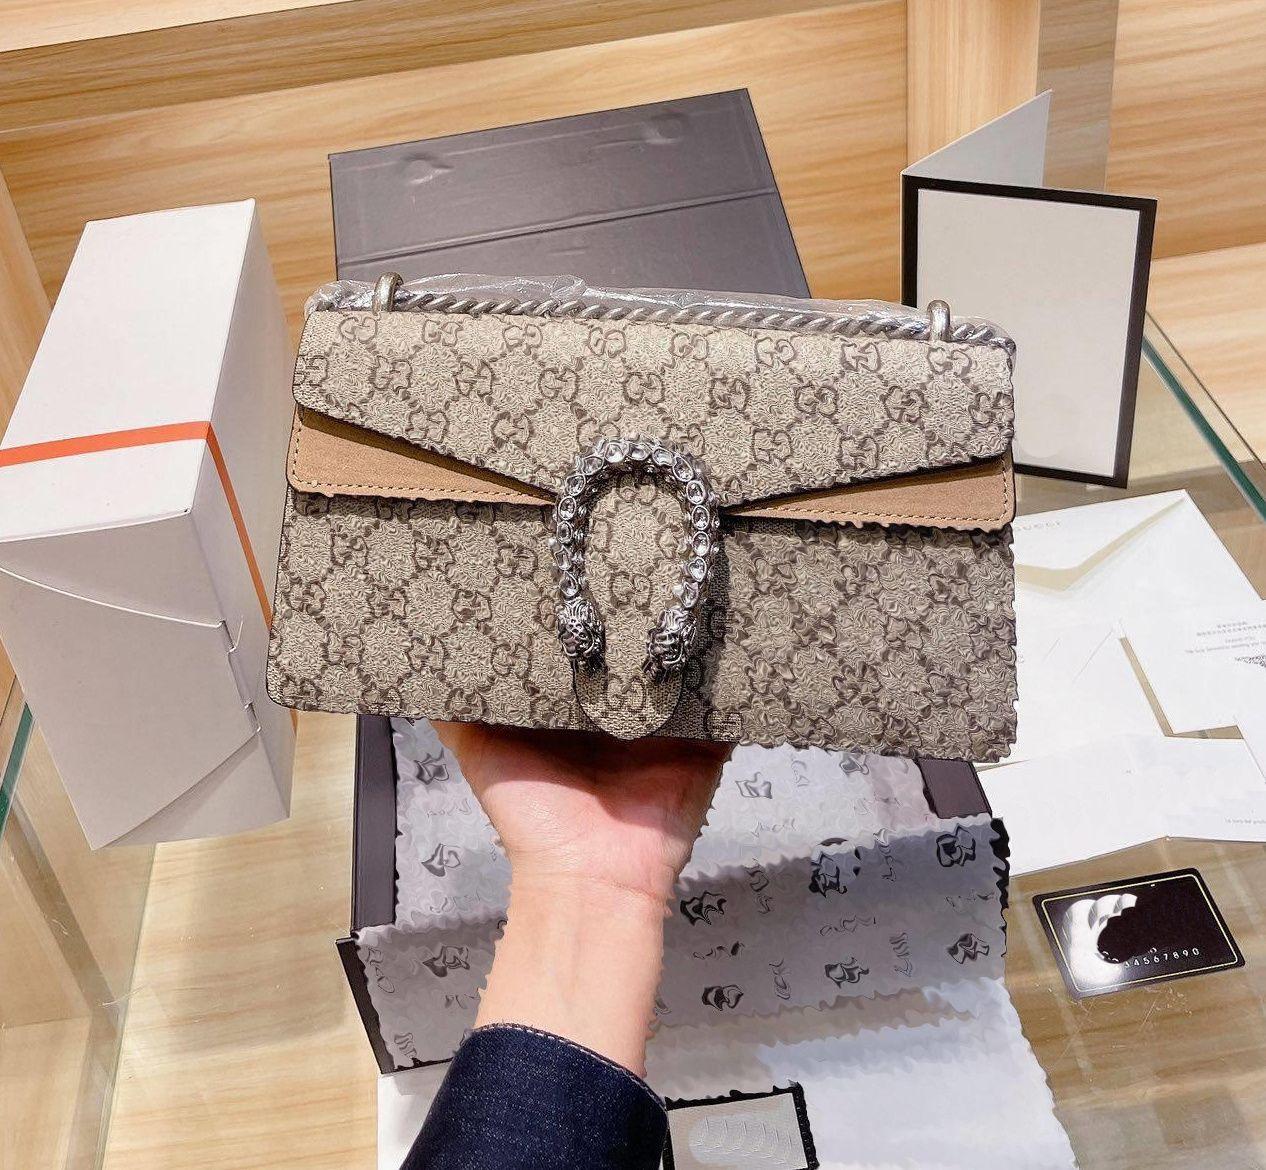 Designer Crossbody Tote Borsa a tracolla Messenger Handbag Portafoglio Sella Sacchetto Lvlouis Zaino con logo Gucci A59